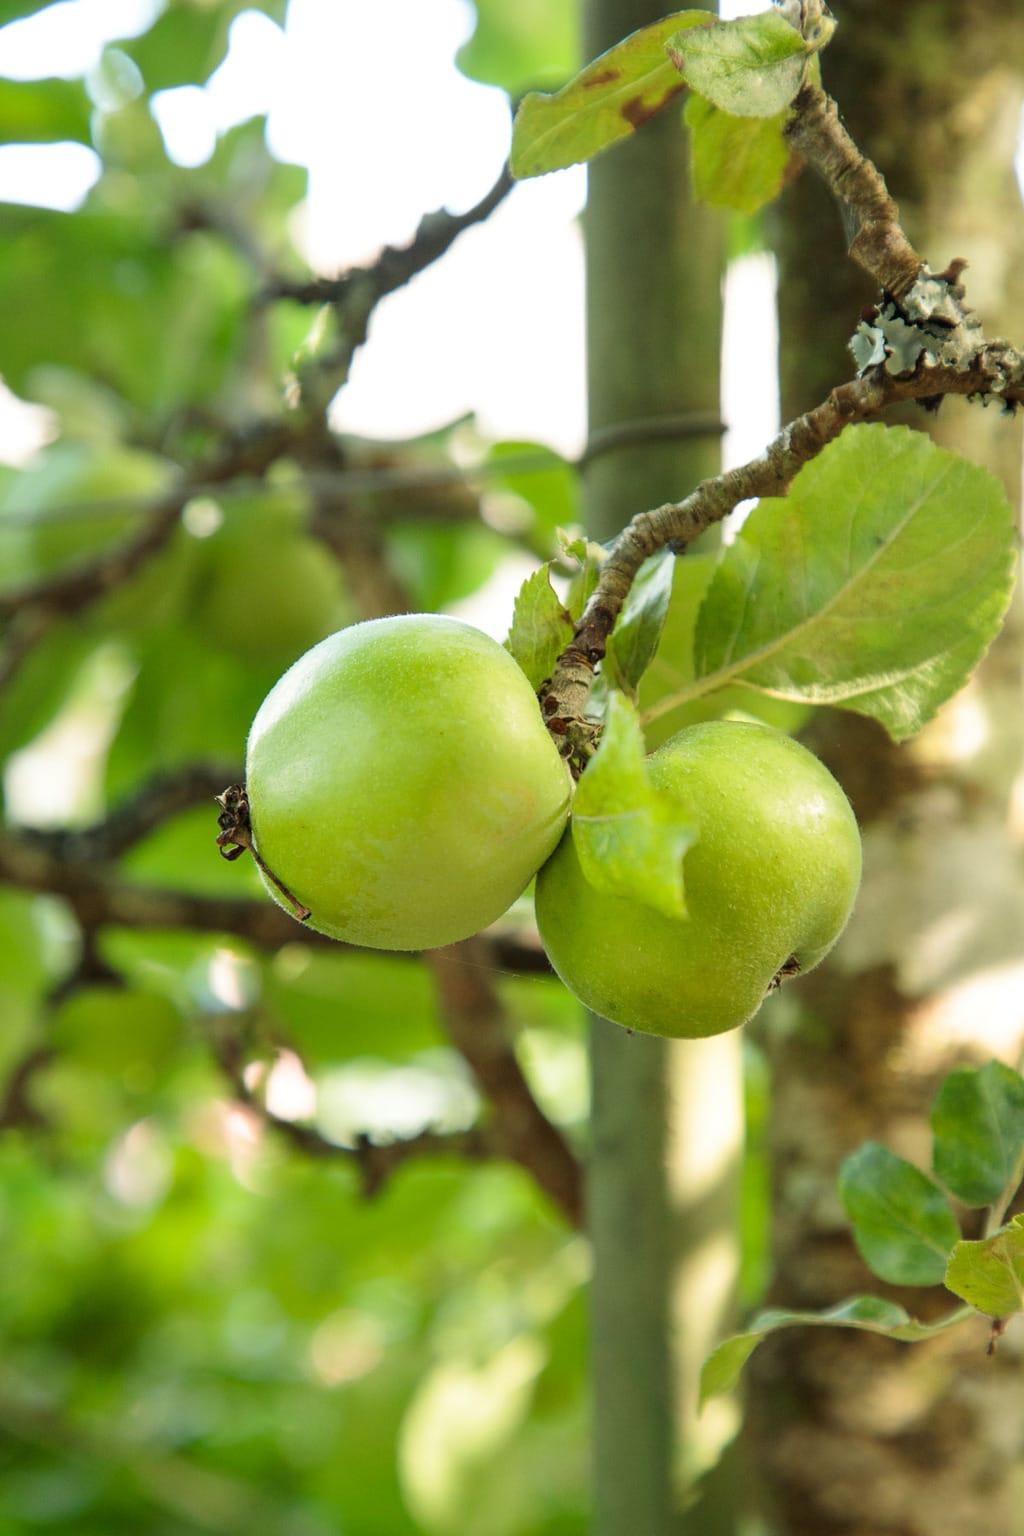 Ultra closeup photo of apples on an apple tree at Ballymaloe Farm.